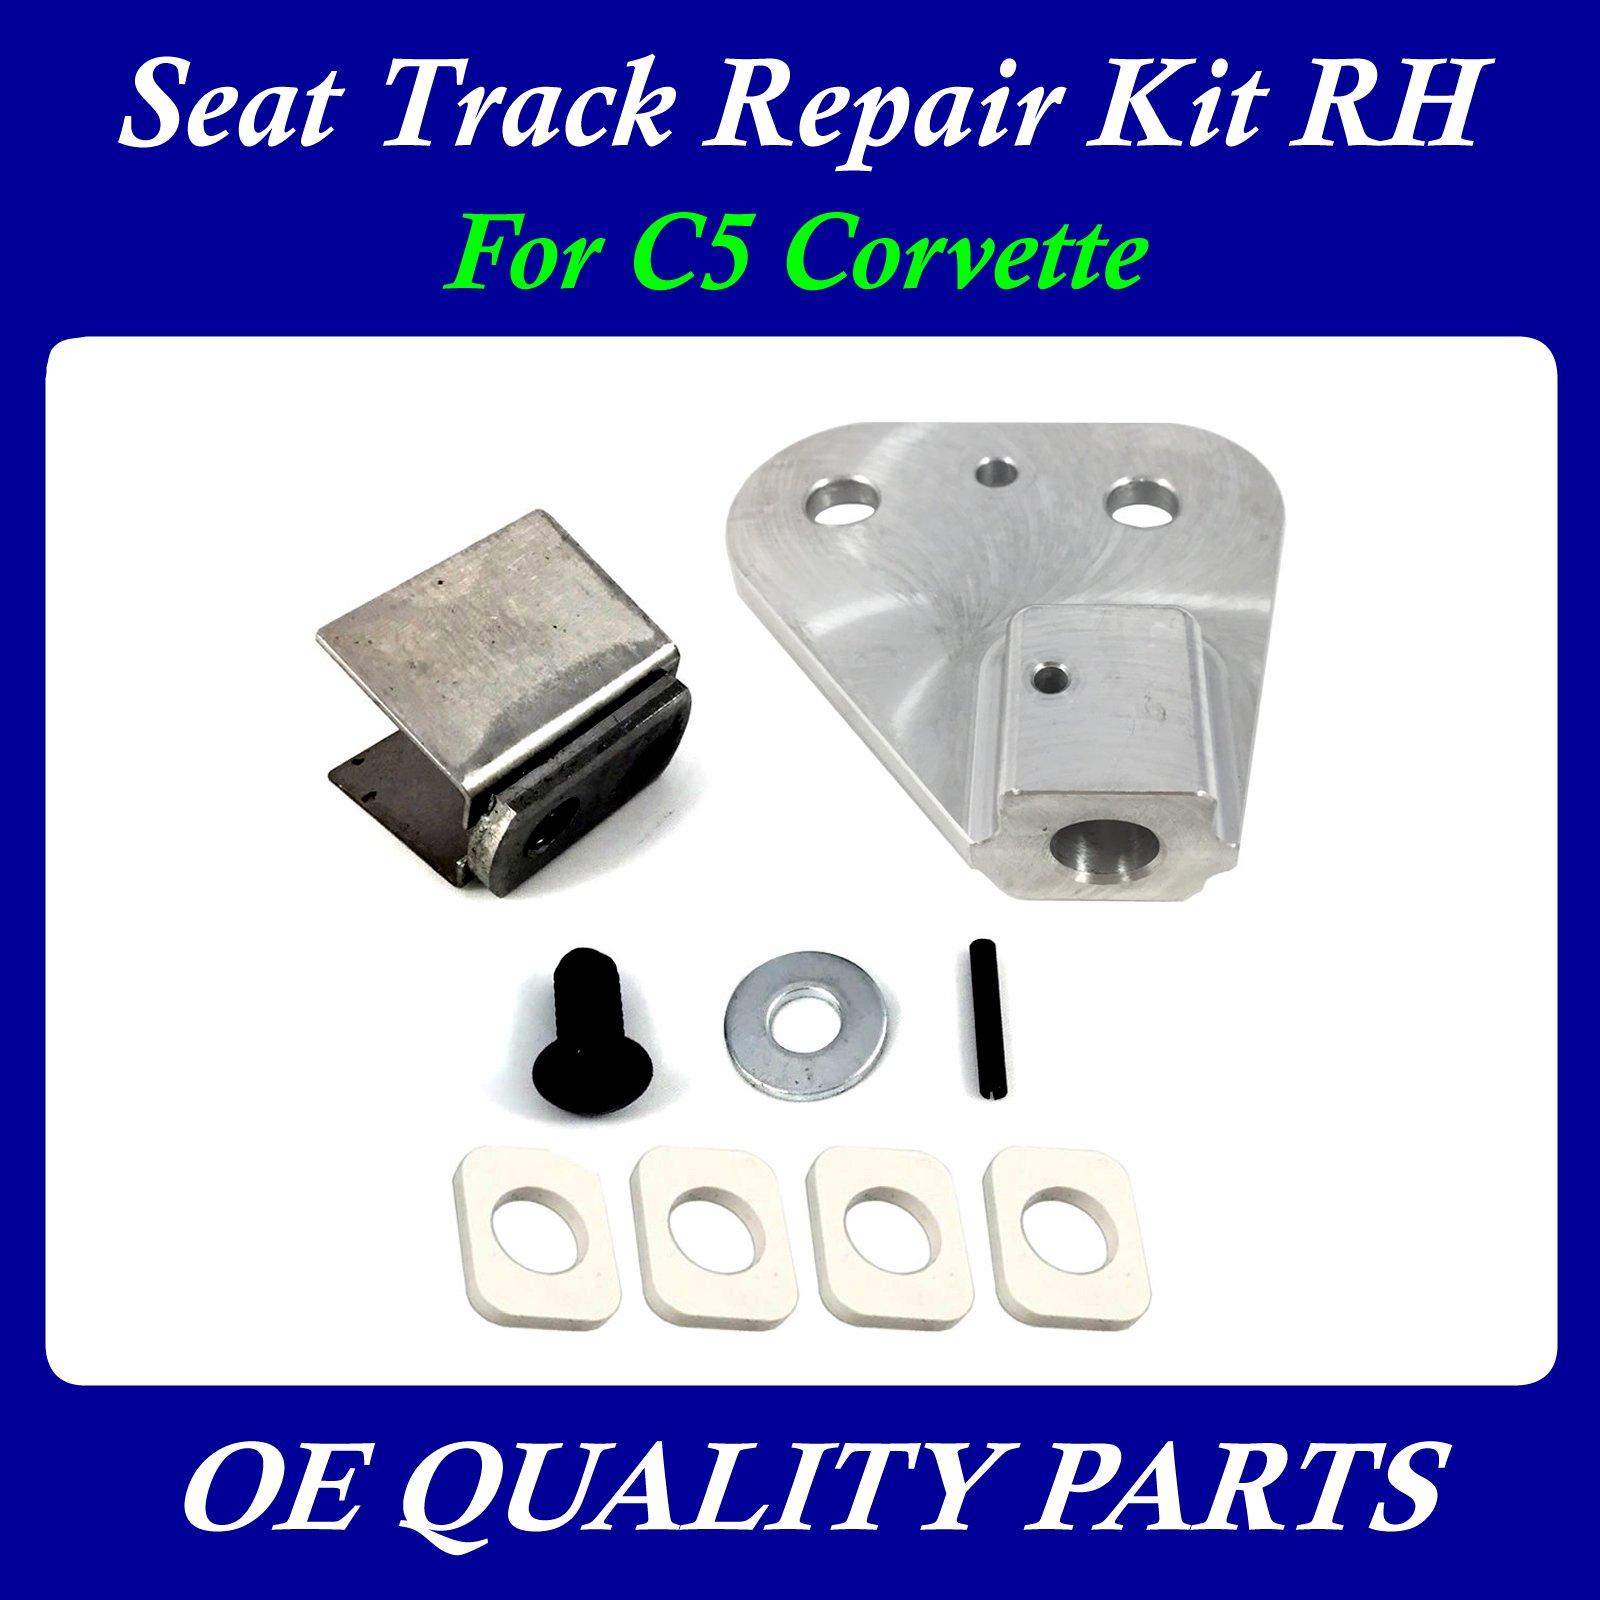 2 seats C5 /& Z06 Corvette Seat Track Repair